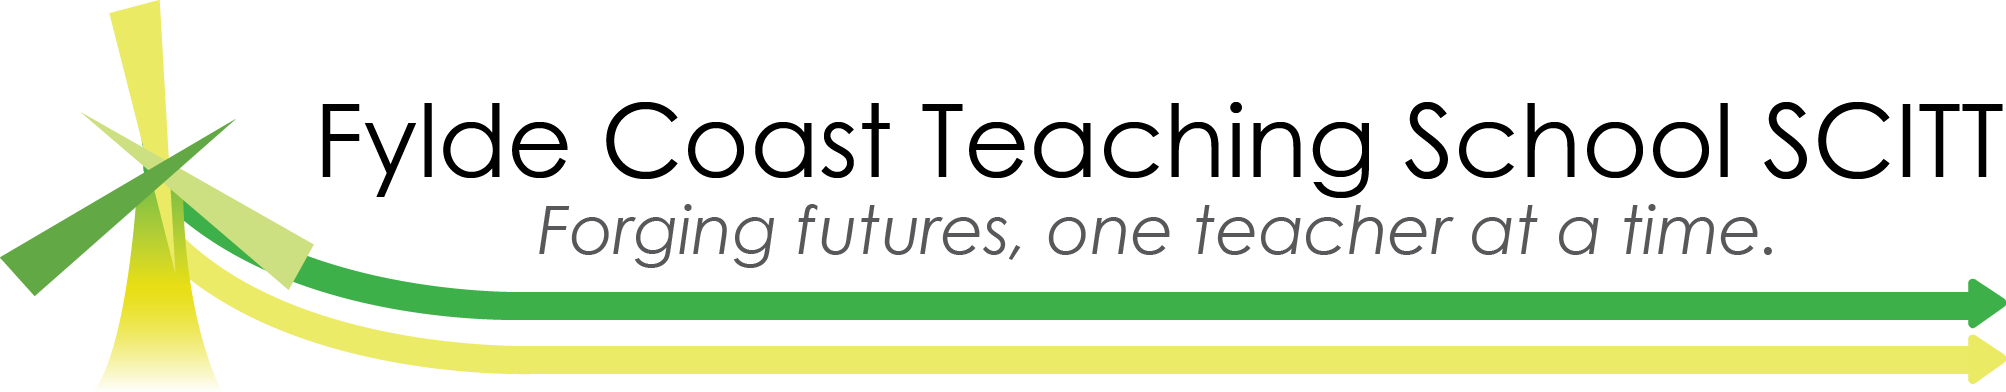 scitt logo